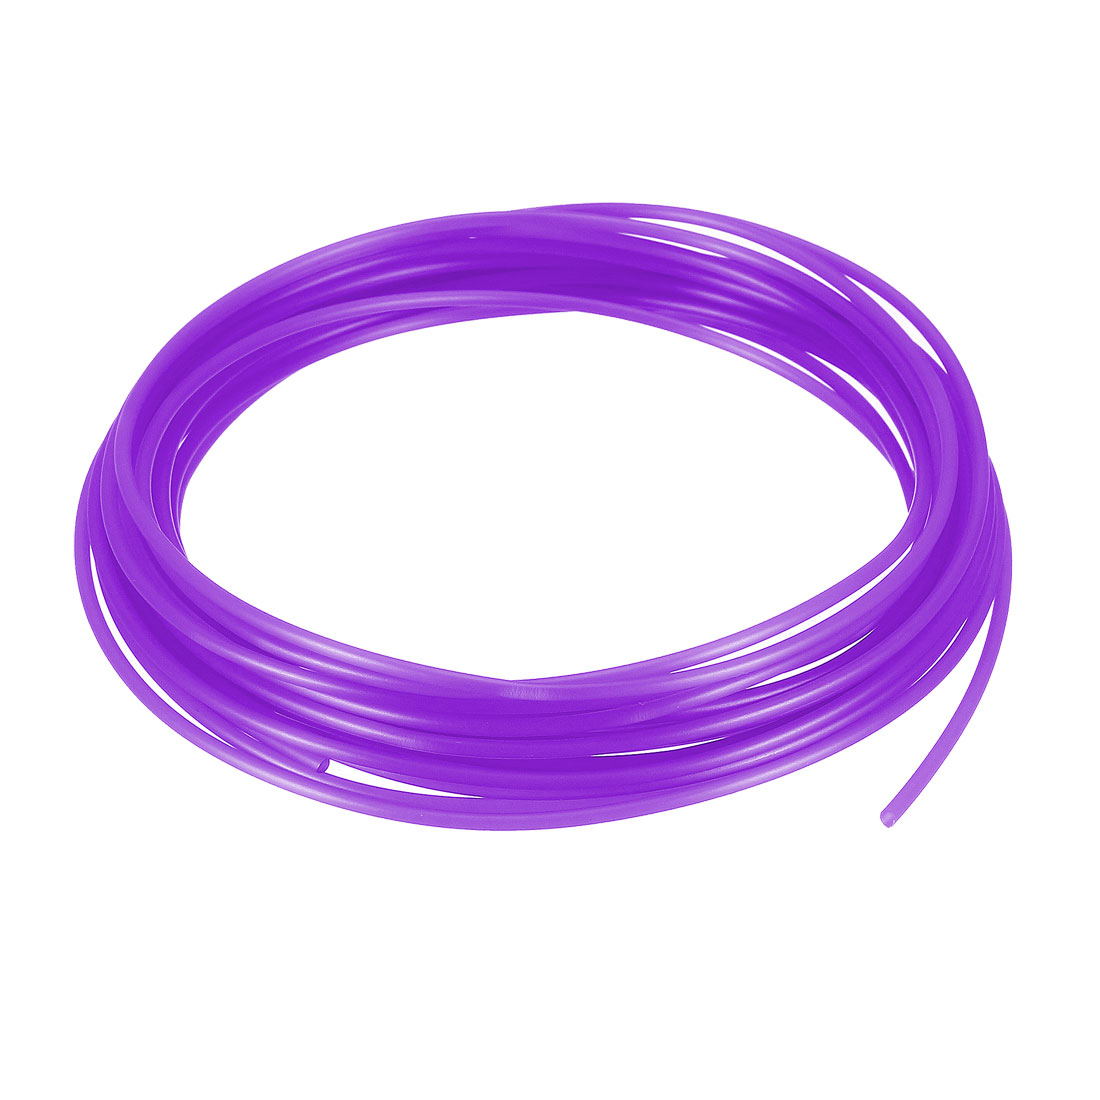 5 Meter/16 Ft PLA 3D Pen/3D Printer Filament, 1.75 mm Transparent Purple